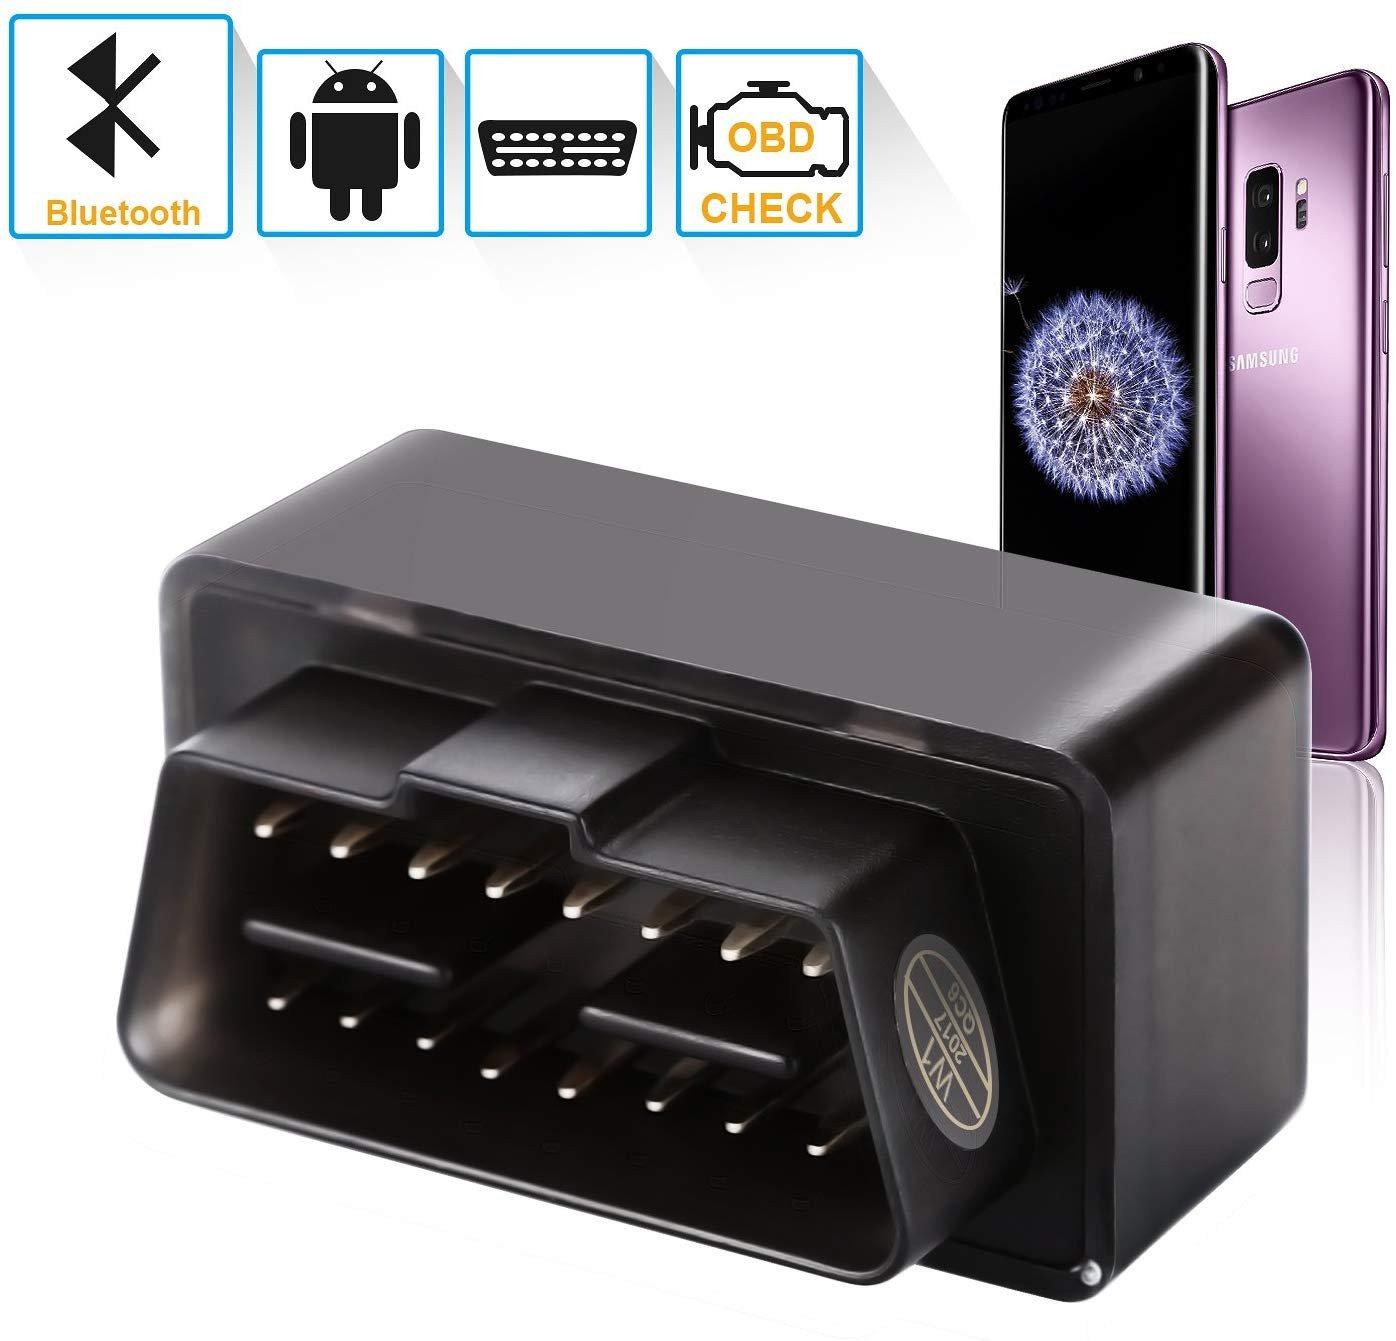 OBD2 Auto diagnostische scanner voor IOS, Android & Windows (Bluetooth OBDII)